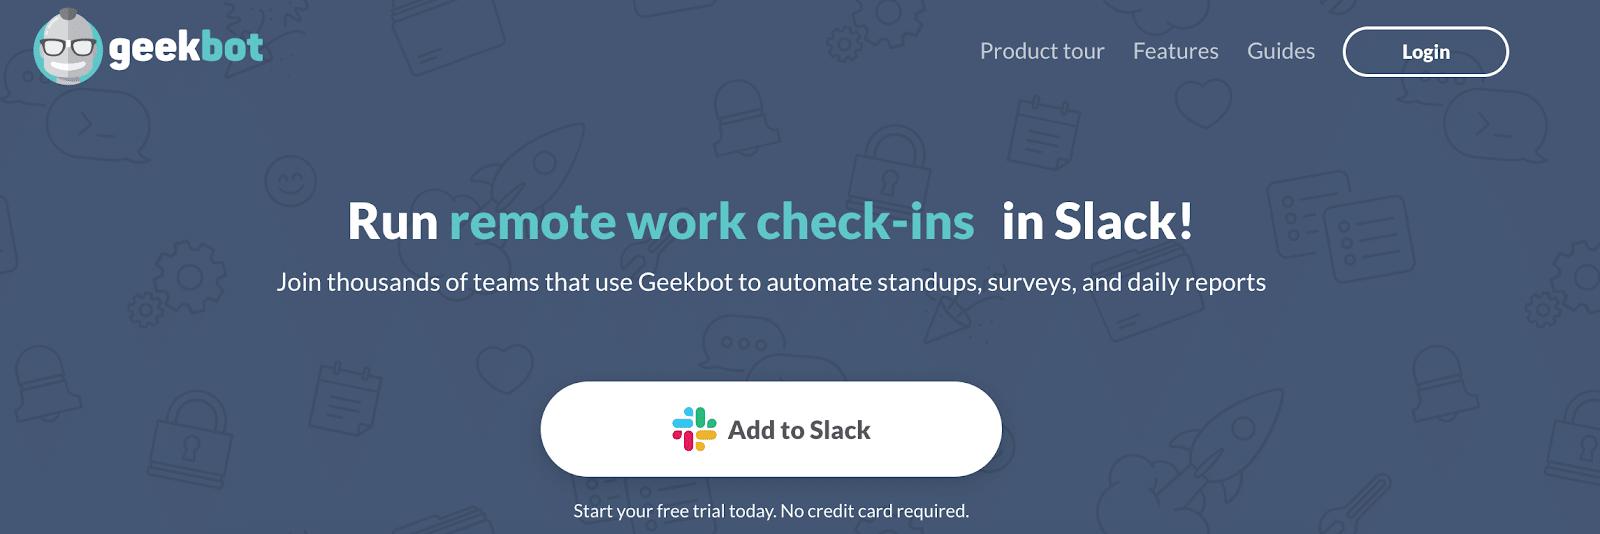 Geekbot.com homepage: Run remote work check-ins in Slack!